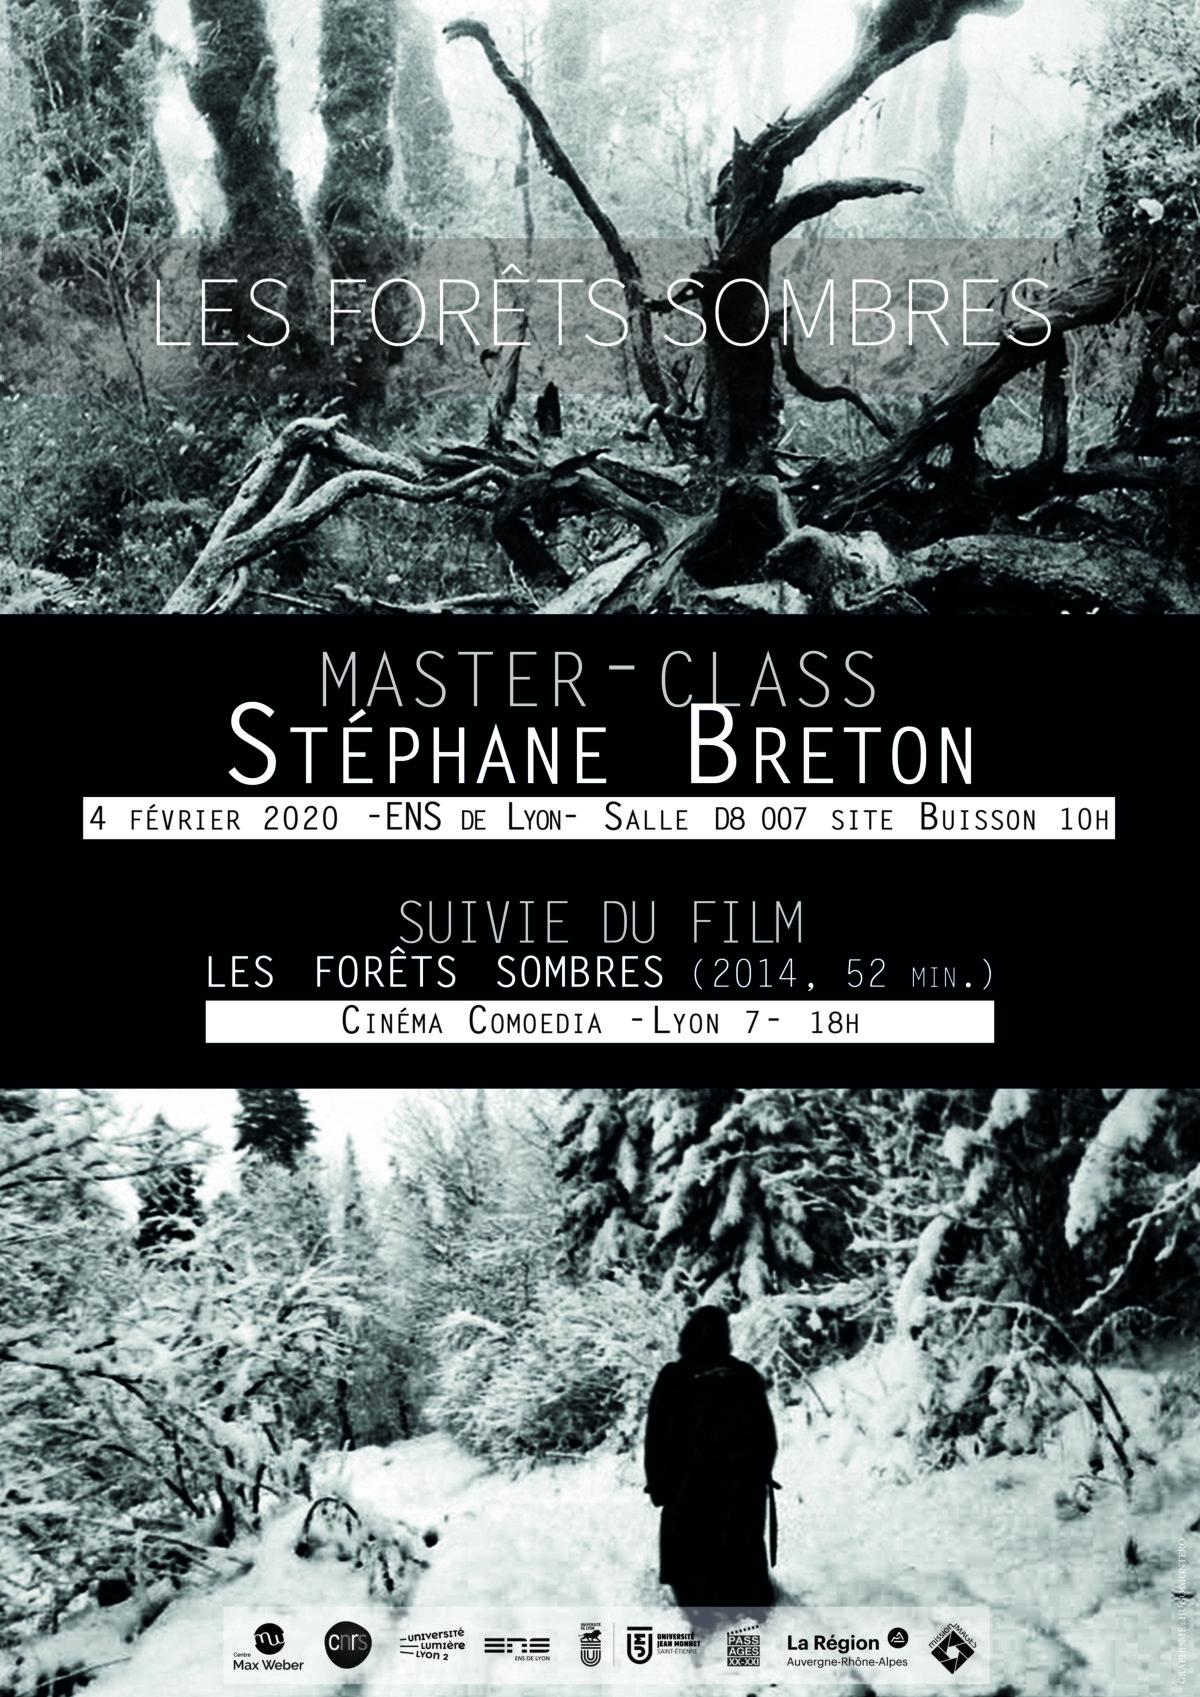 Master-class Stéphane Breton